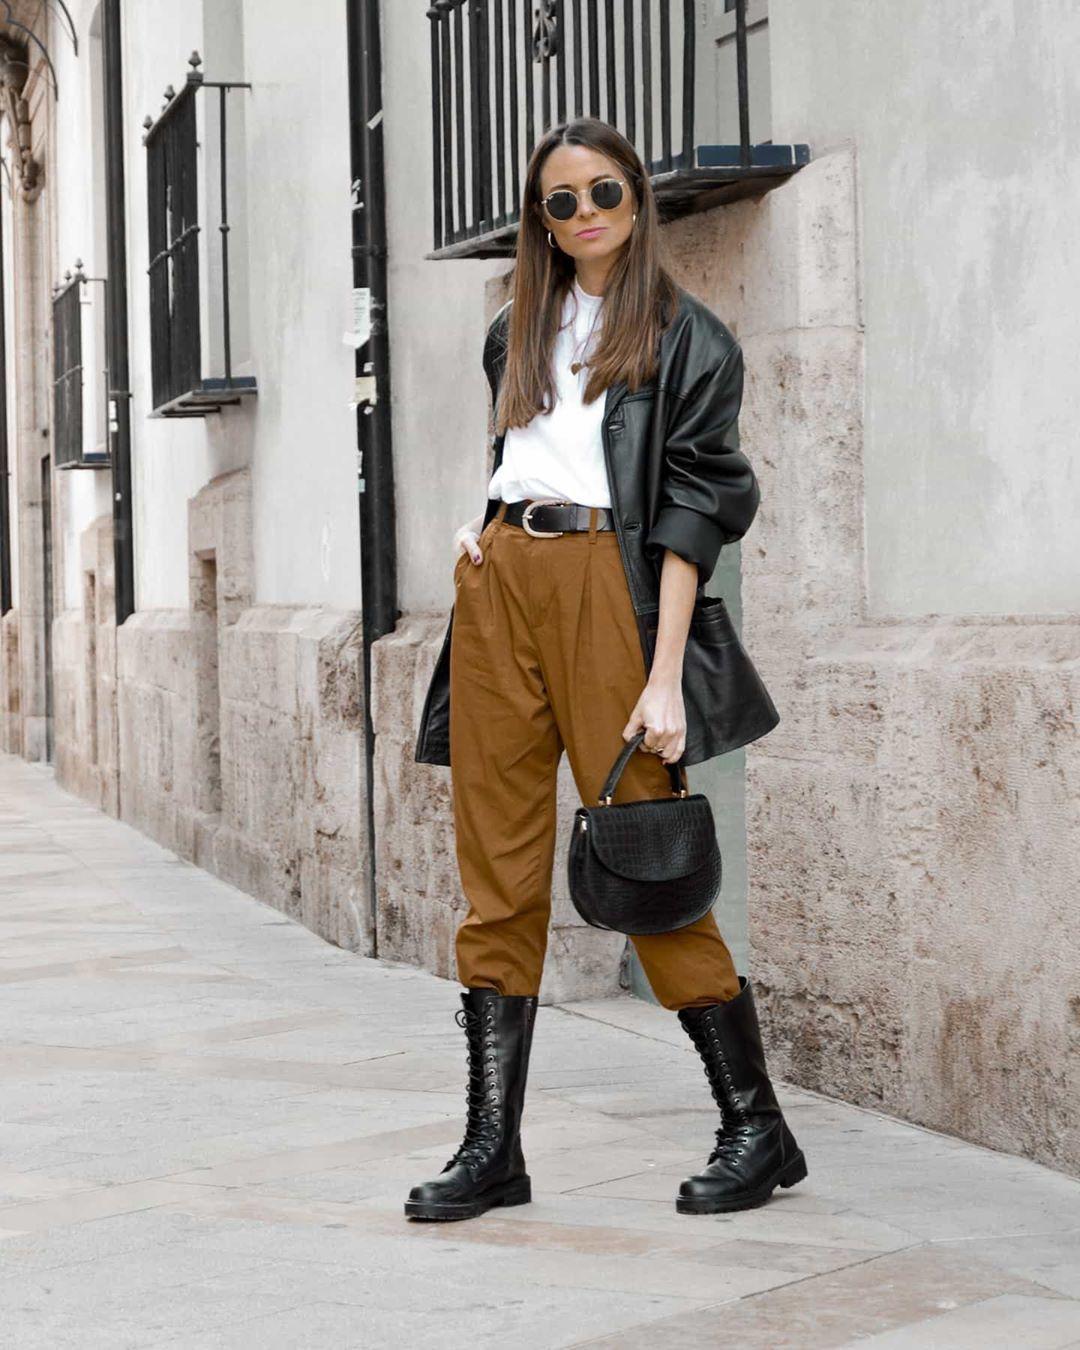 High waist Pants with Leather Jacket